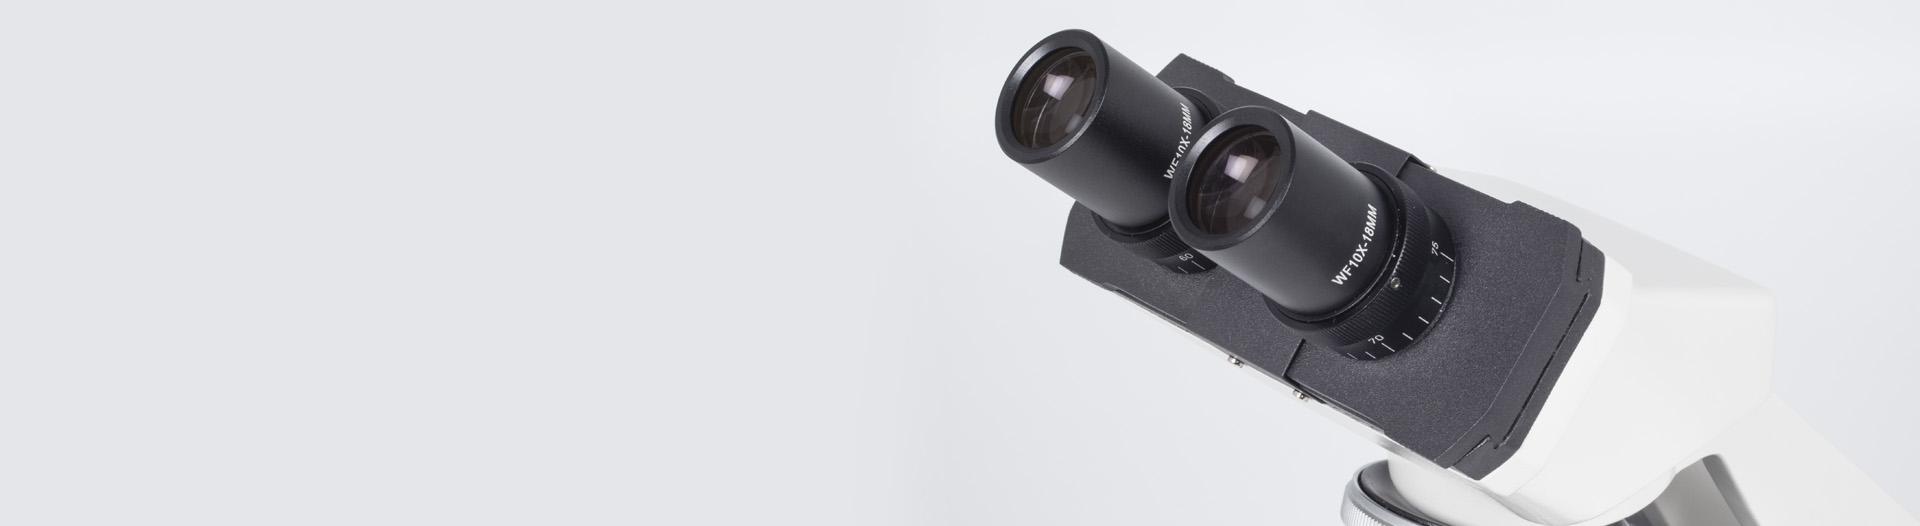 SH KOLLEG microscope Optics